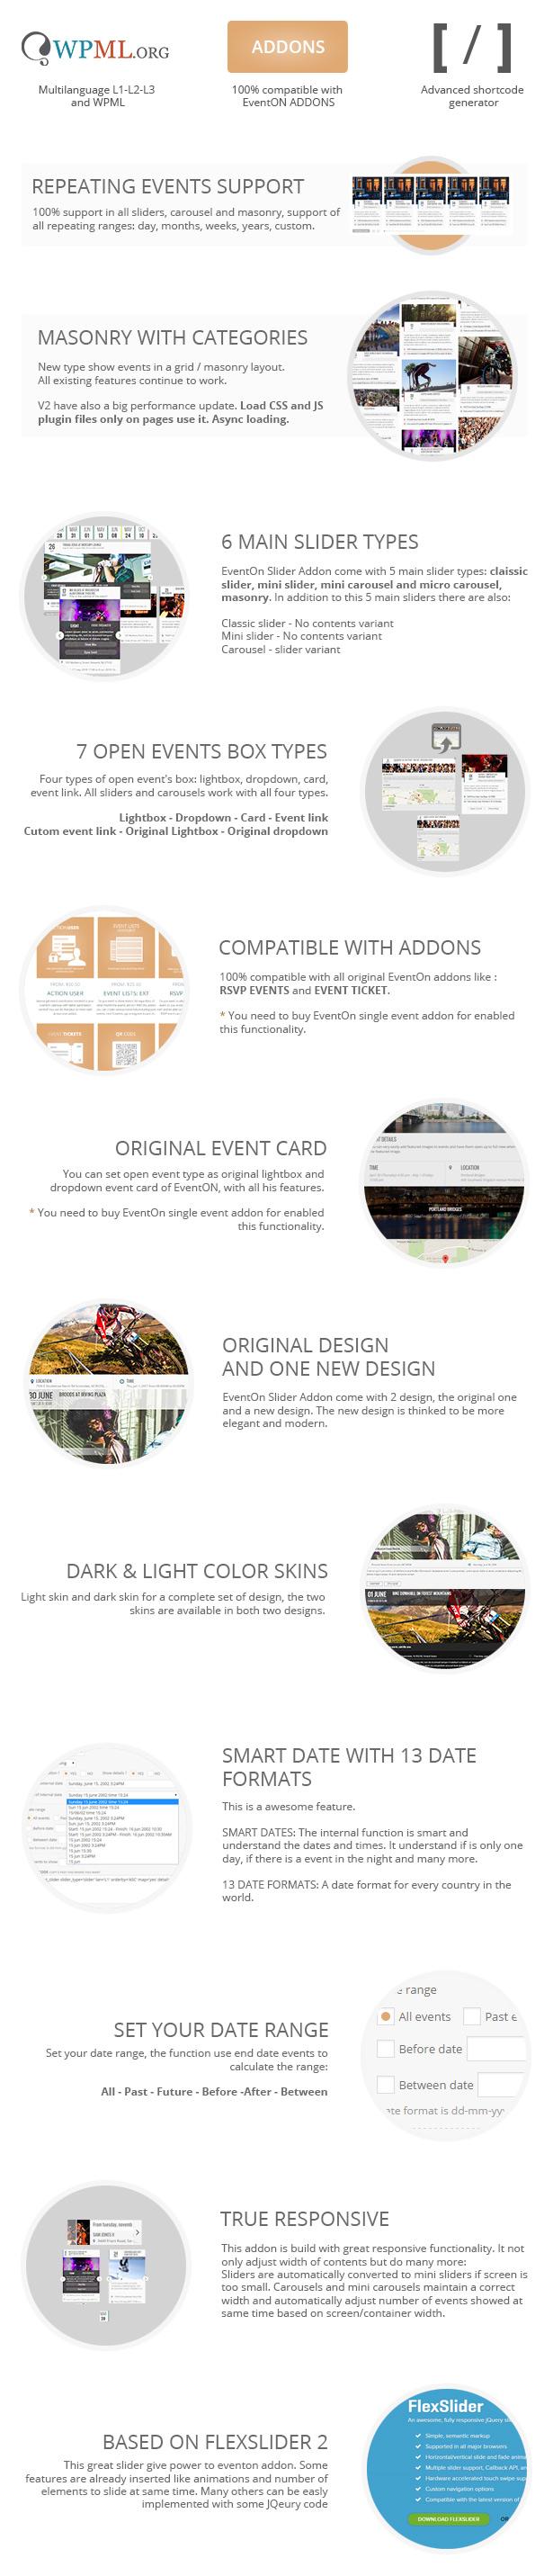 EventOn Slider Addon | Events - 1